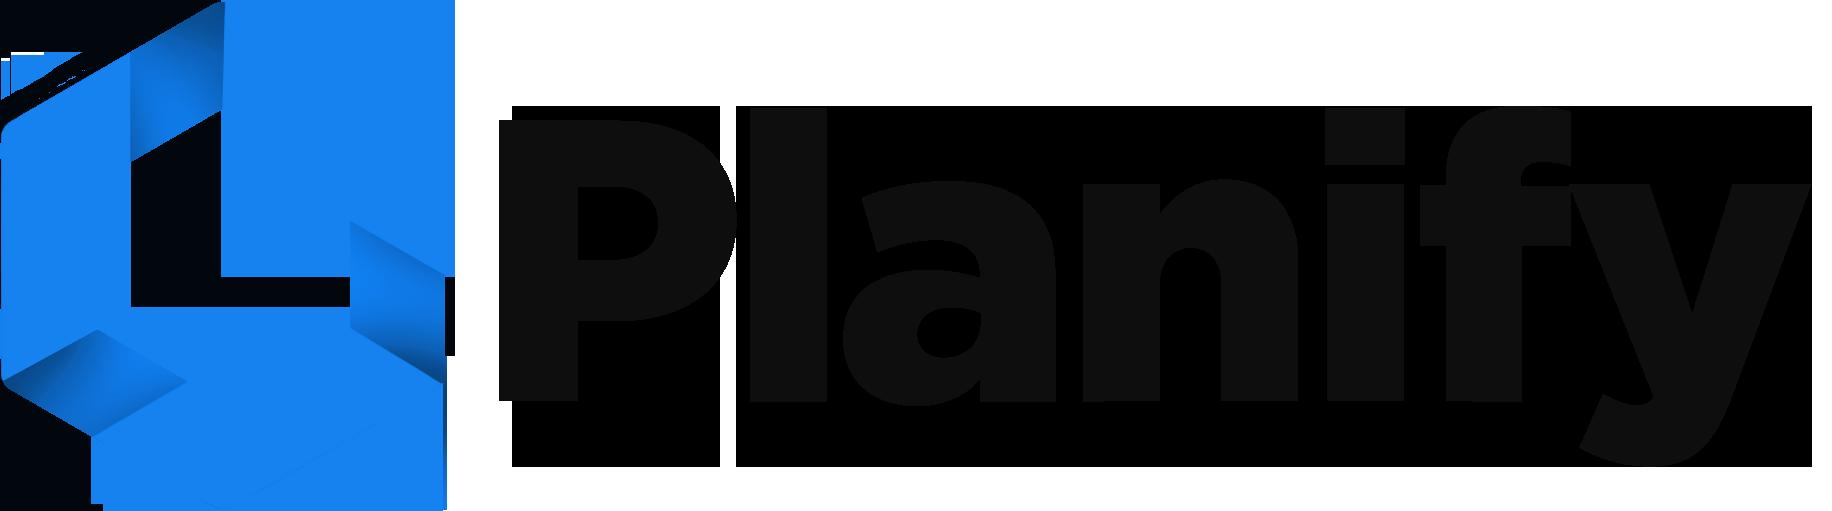 Planify Construction Schedule logo